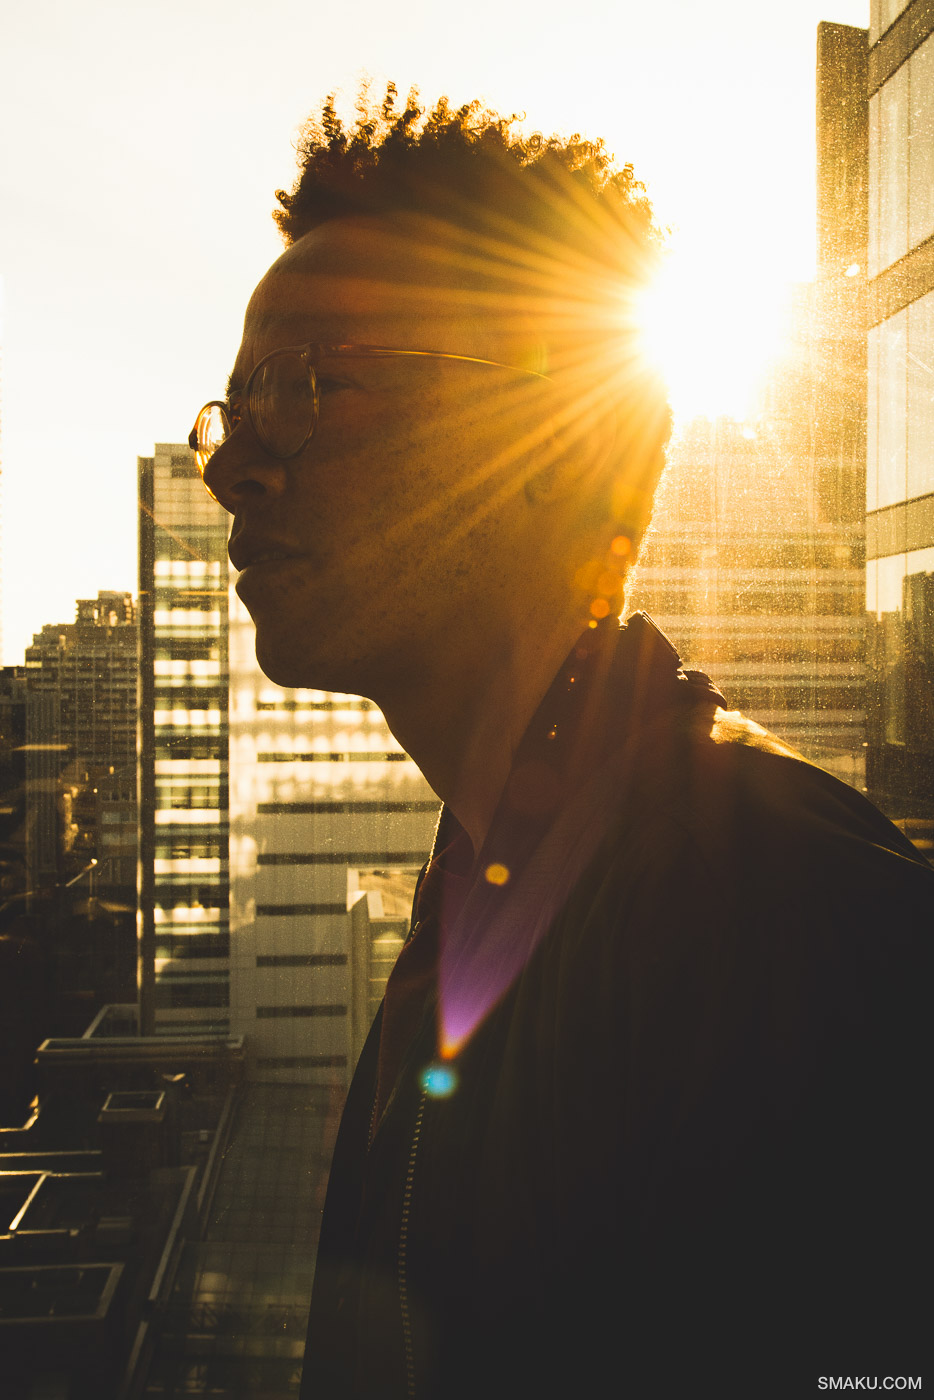 Taha in the sunlight.